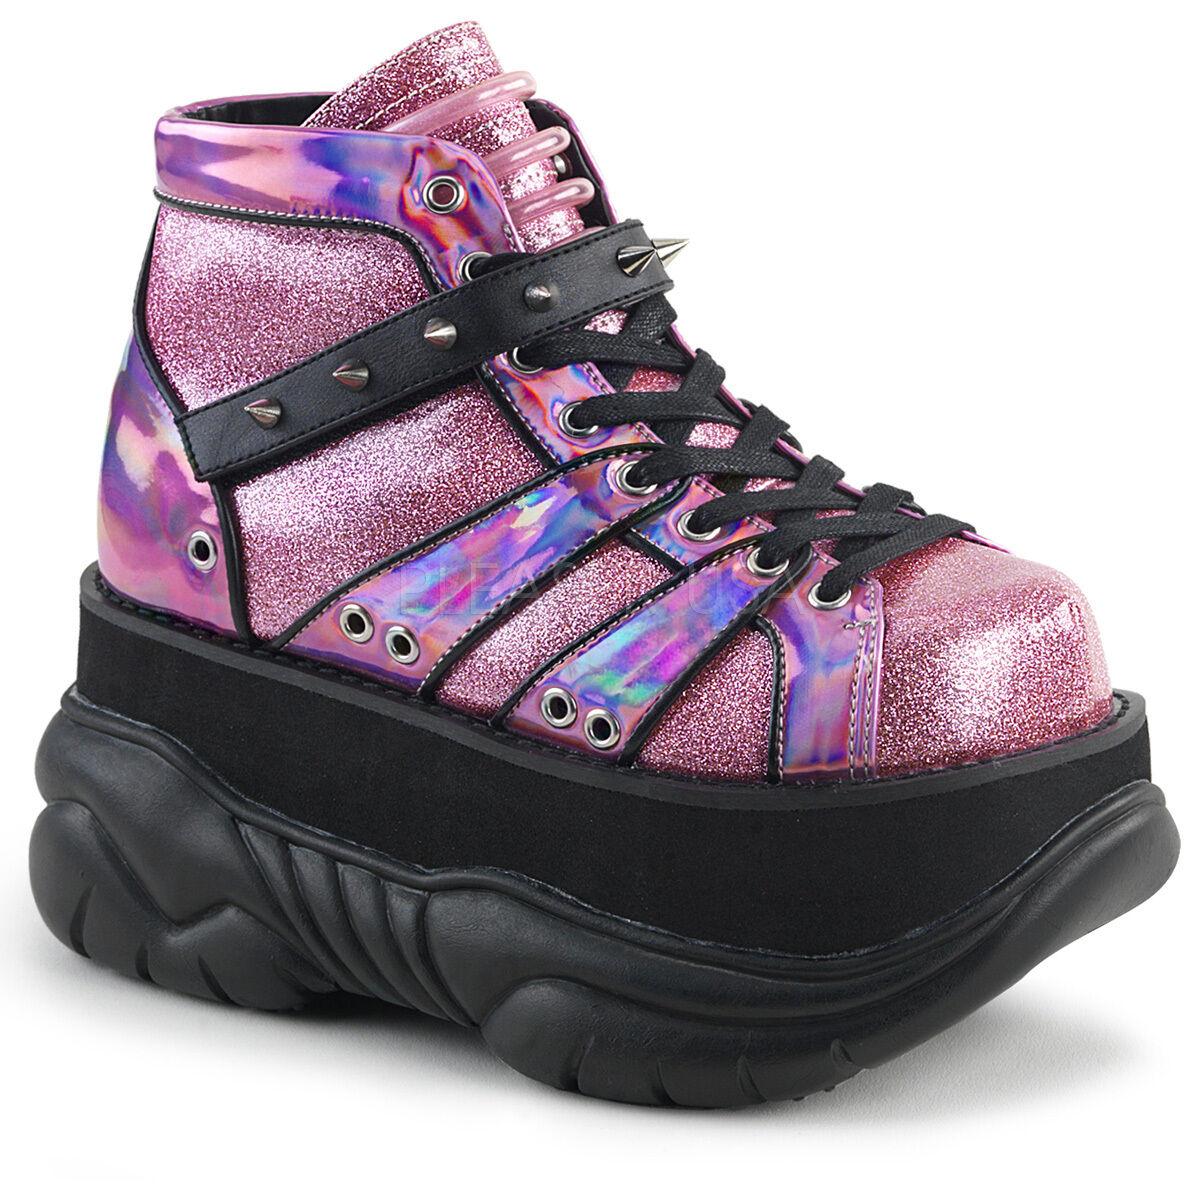 DEMONIA NEP100 pnhg homme gothique punk cyber 3  Plate-Forme Rose Cheville Bottes Chaussures